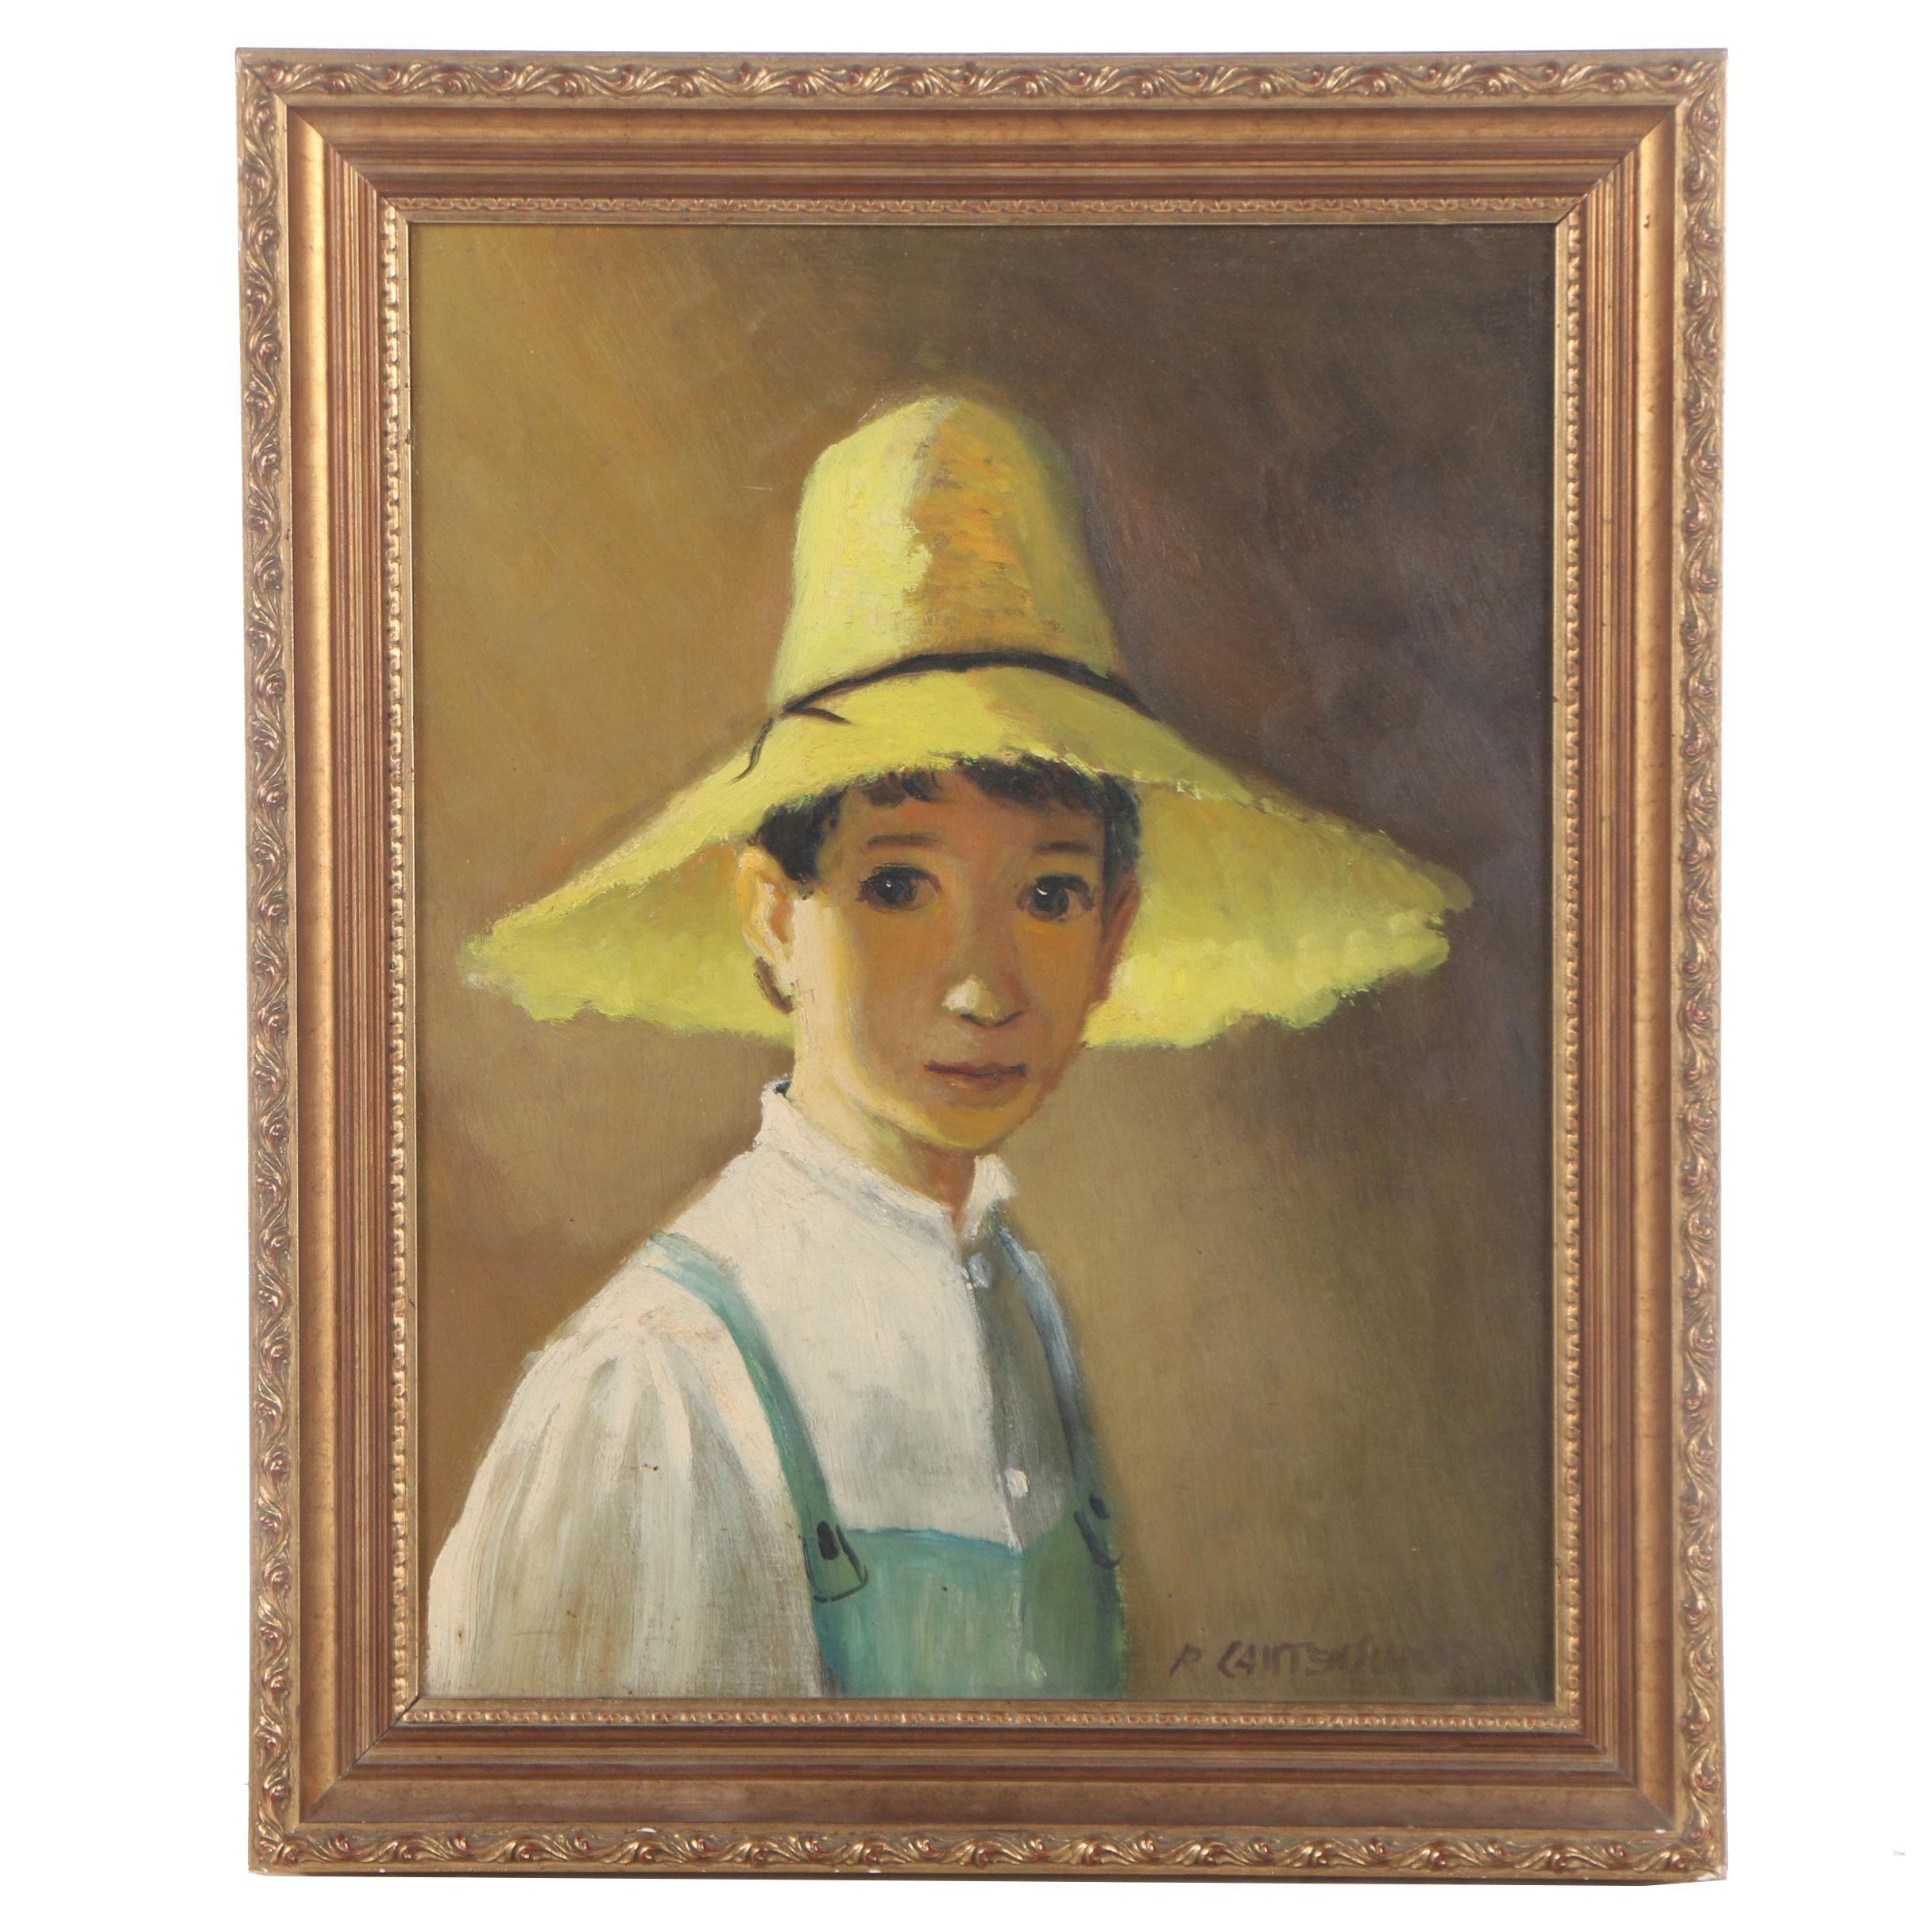 "R. Lautenschoor Oil Painting ""Boy in a Straw Hat"""